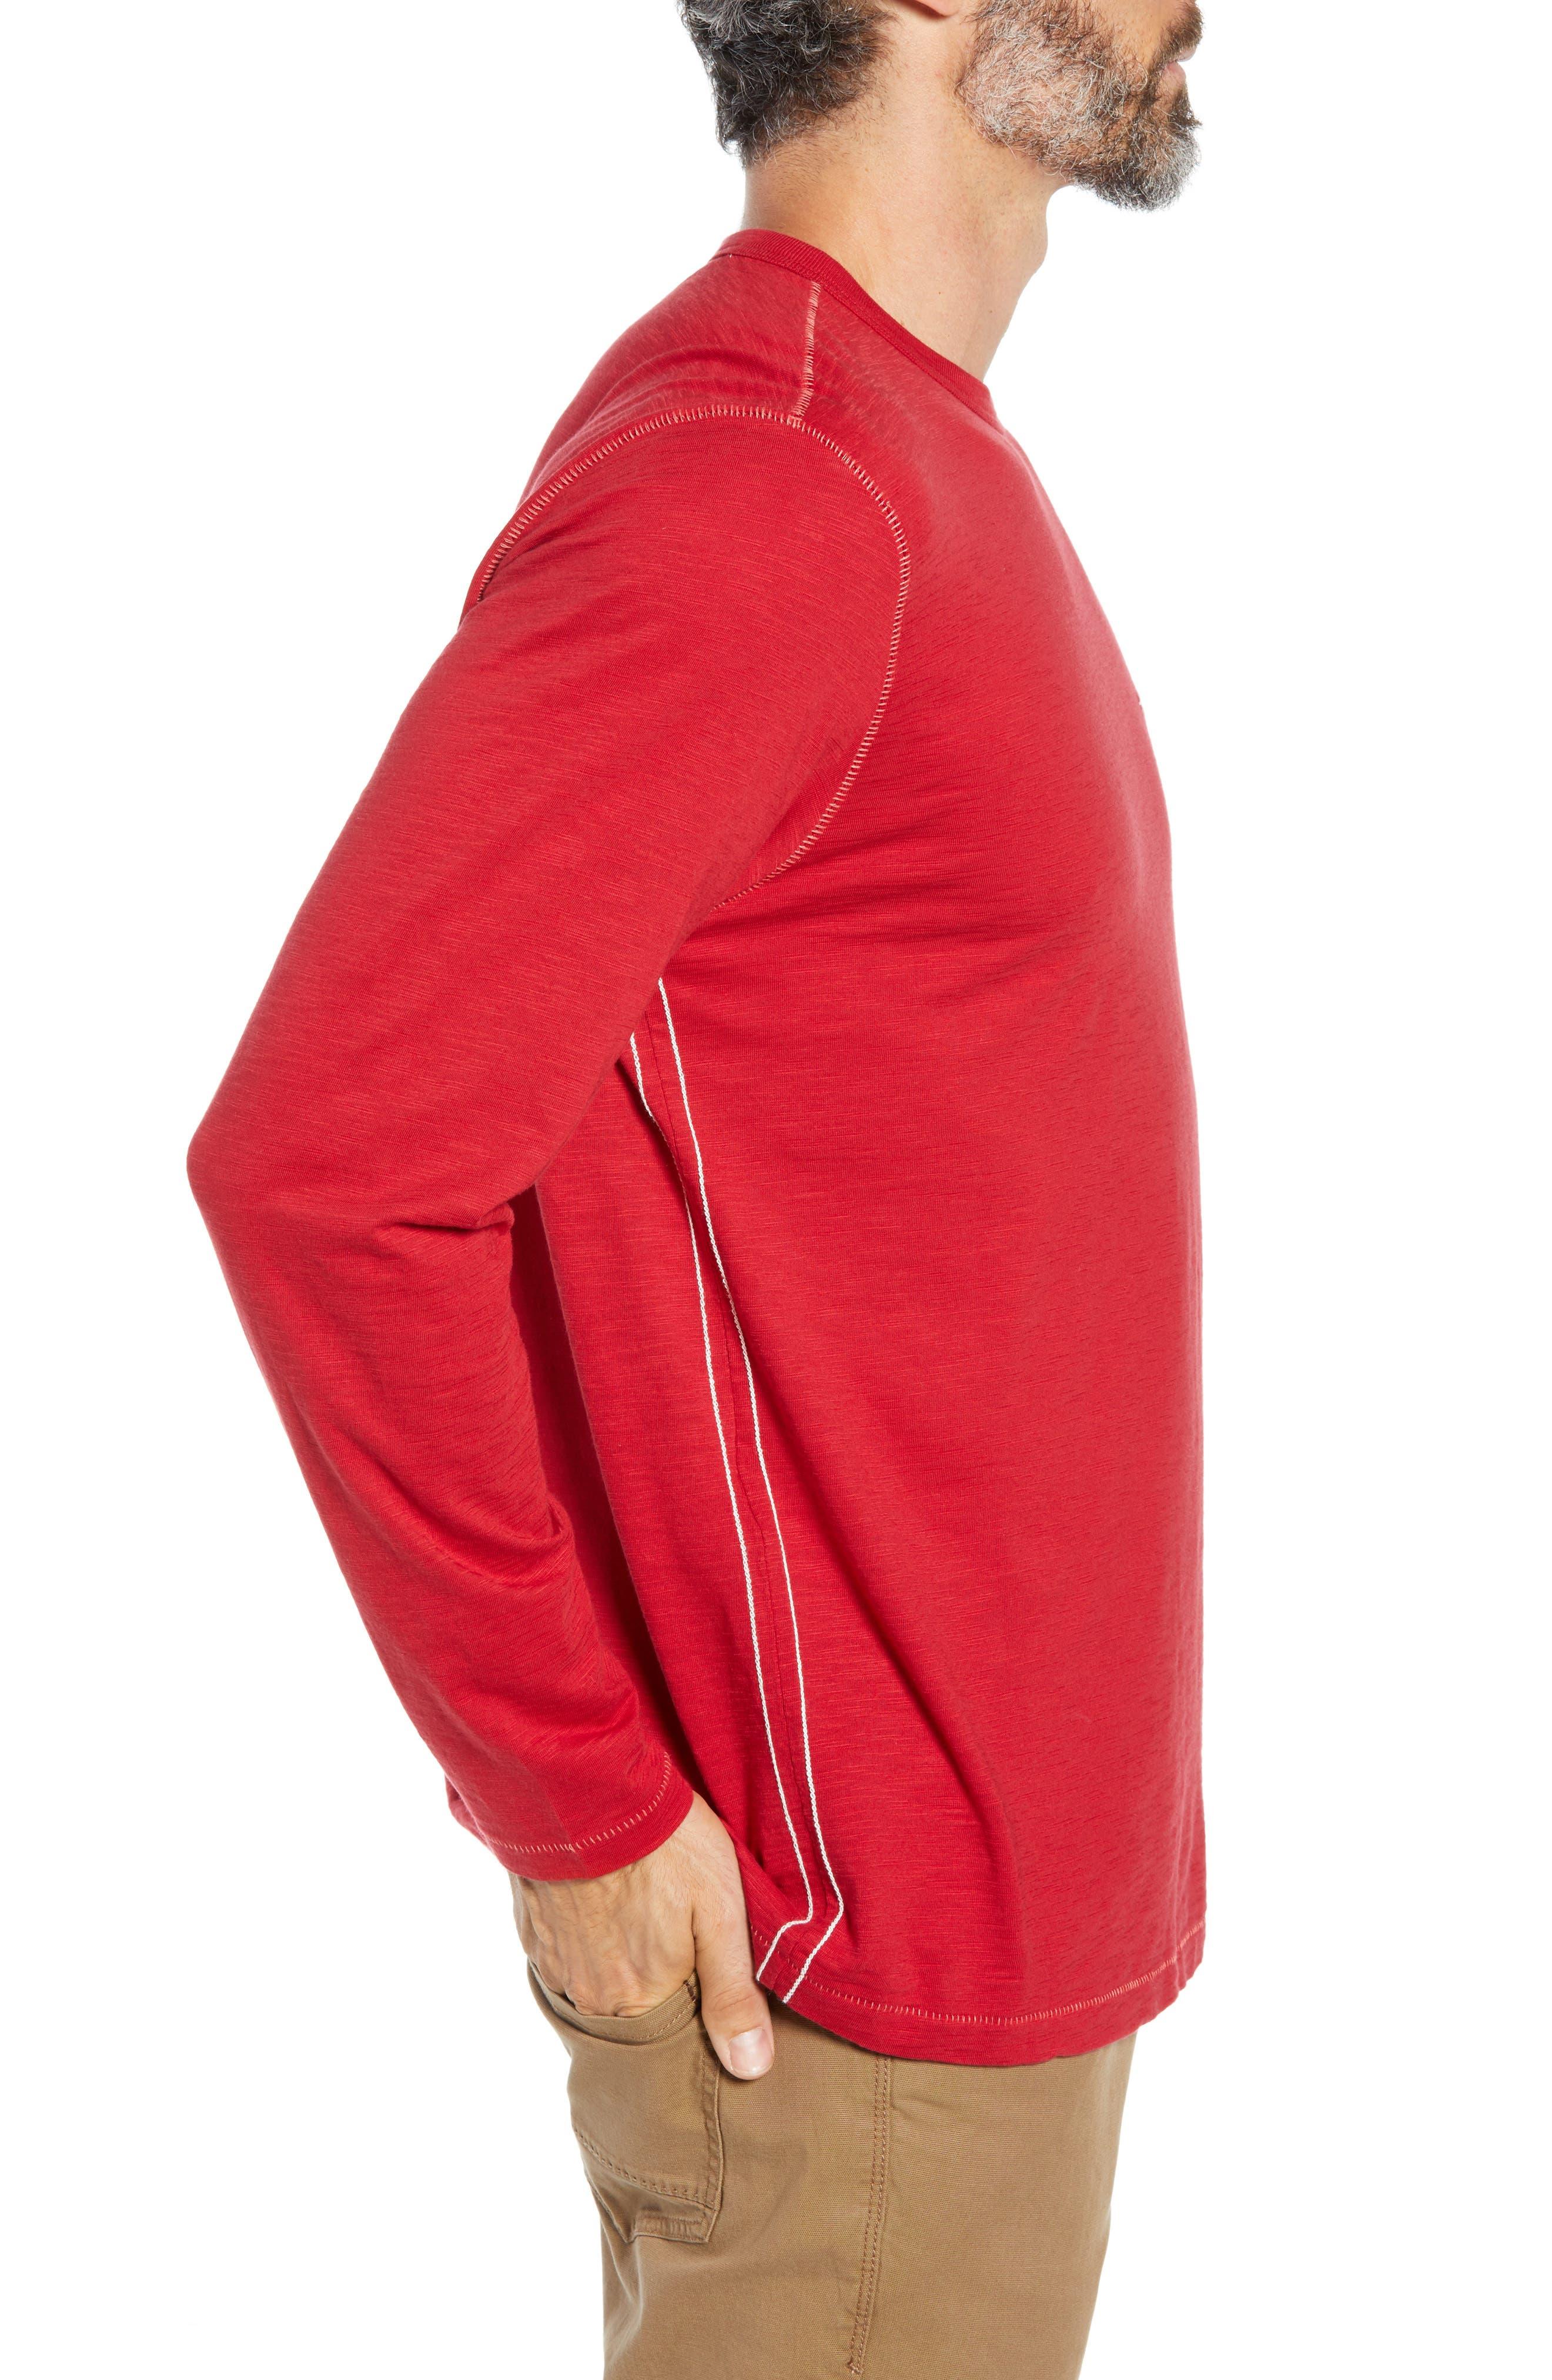 Mele Kalikimaka T-Shirt,                             Alternate thumbnail 3, color,                             SCOOTER RED